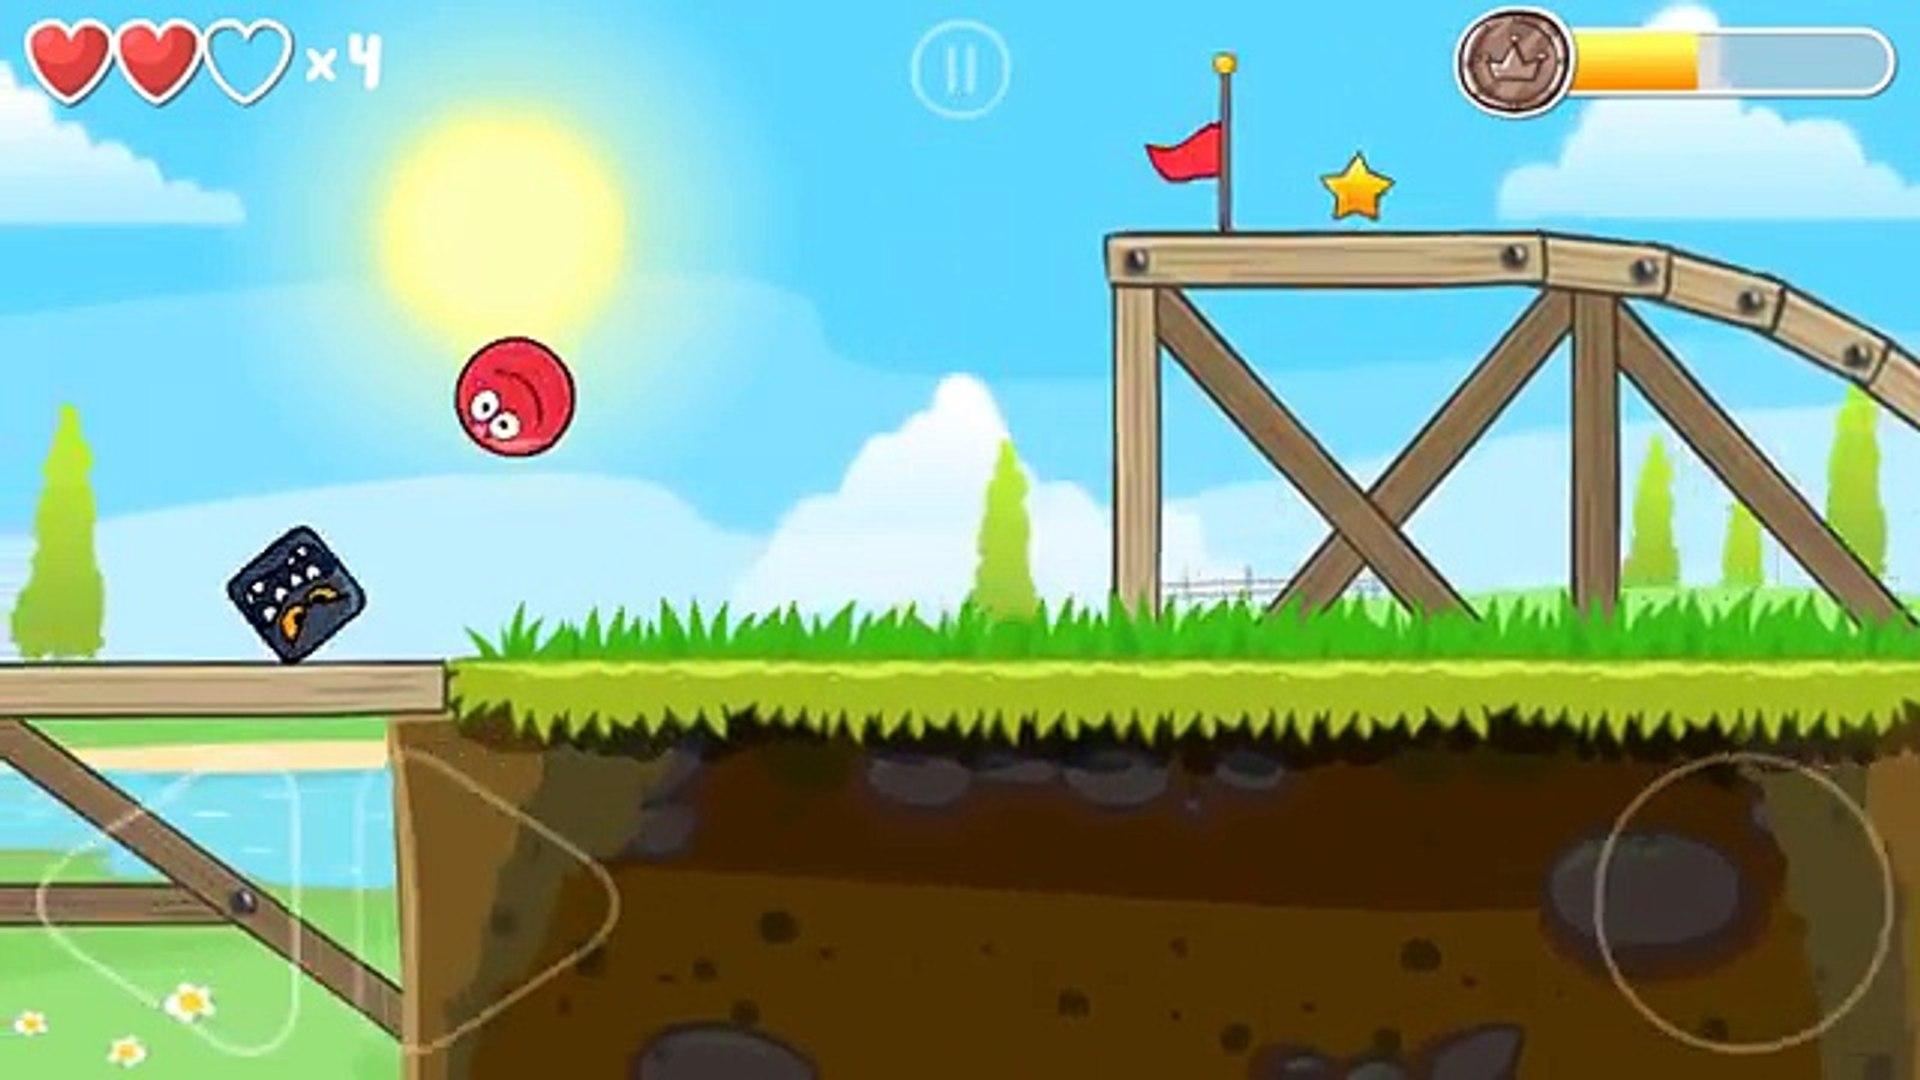 Мультик игра про Красный Шарик [4] по имени red ball [4] от я gamer